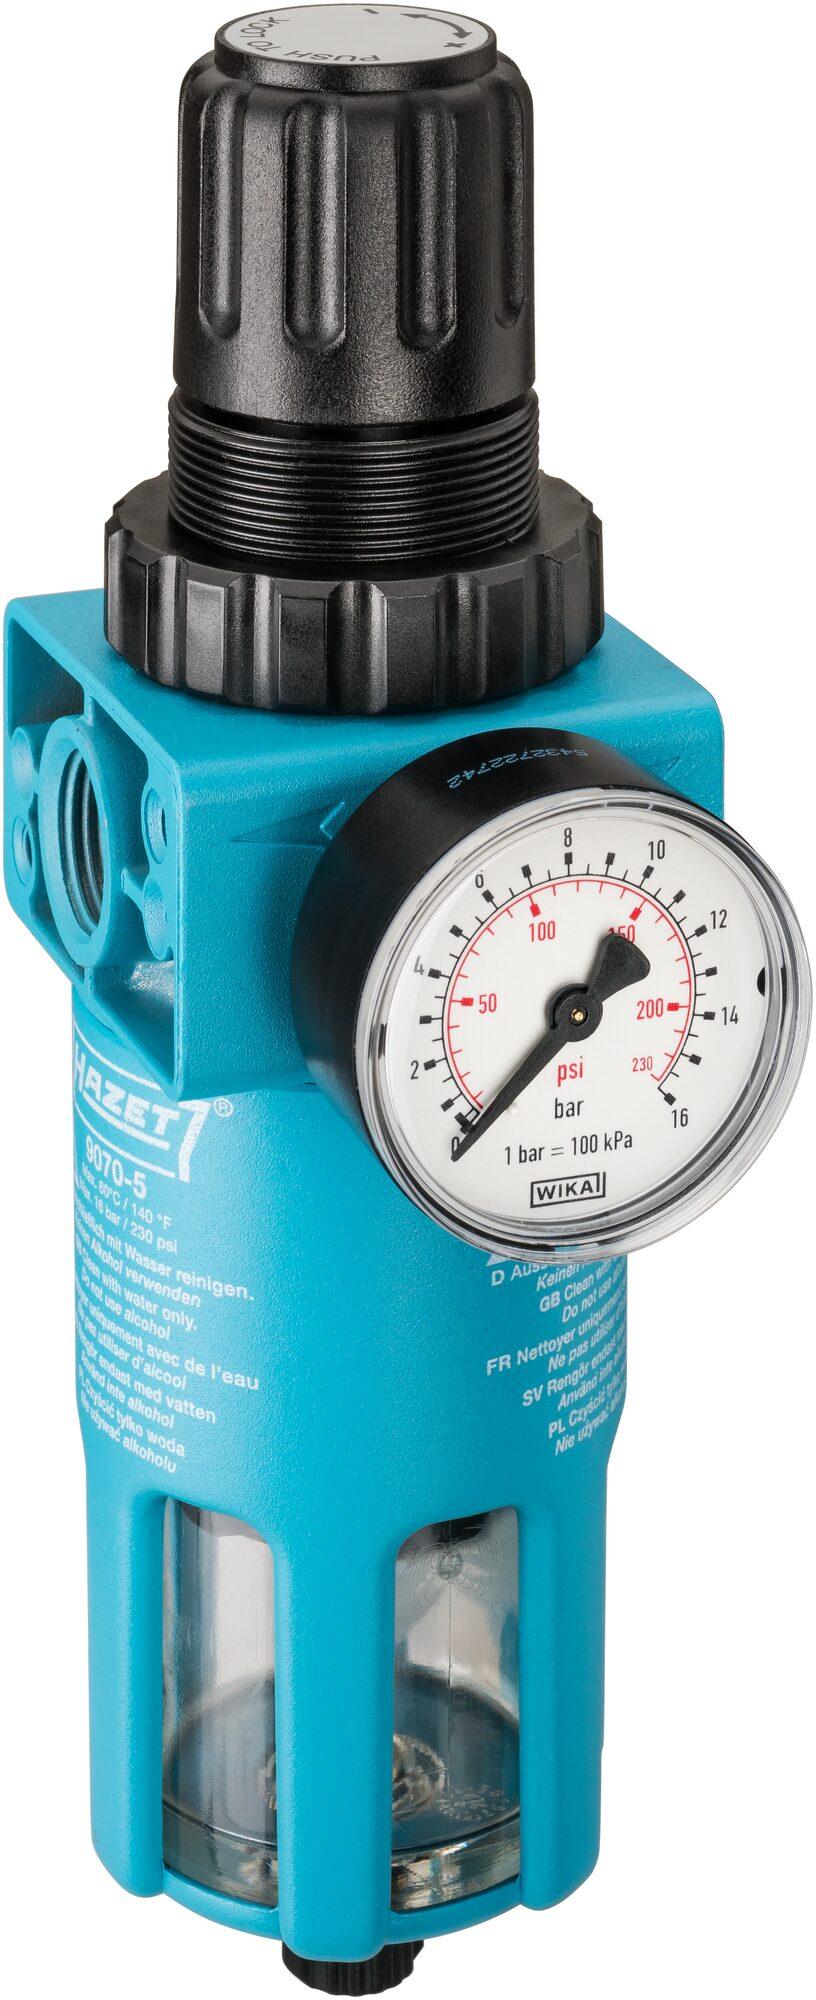 HAZET Filterdruckminderer 9070-5